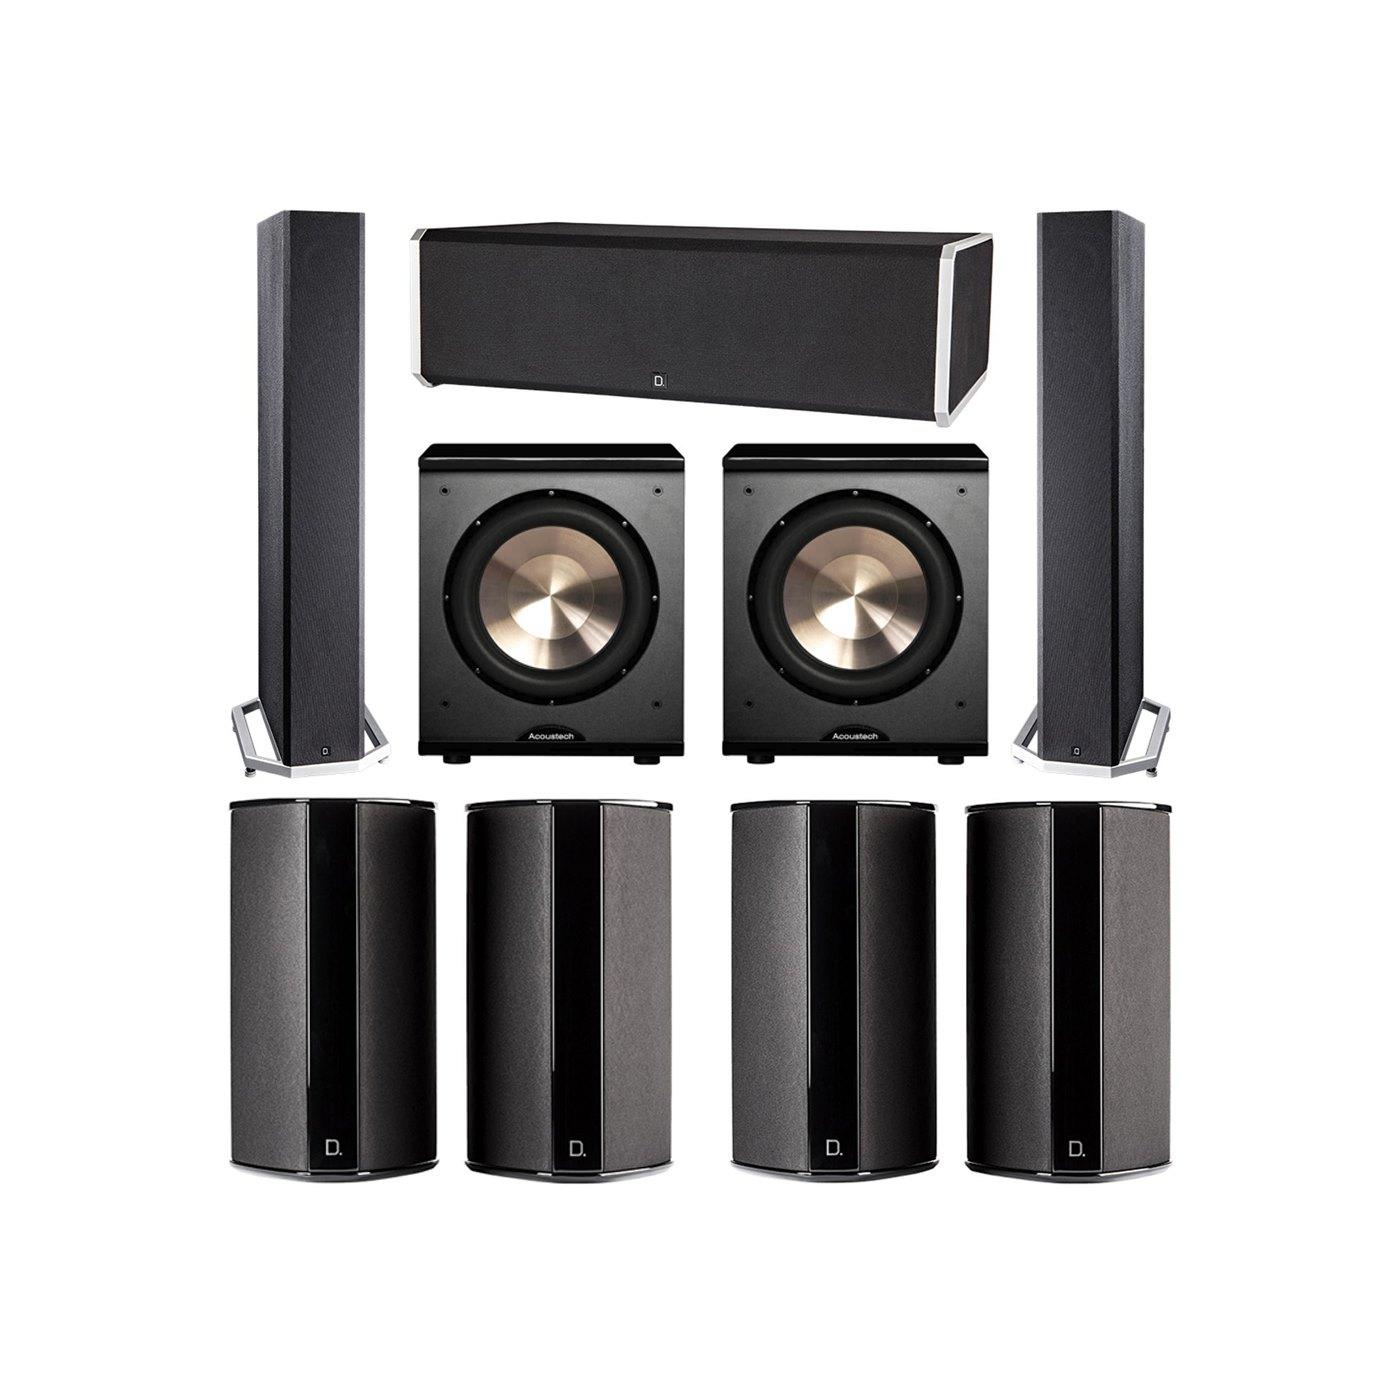 Definitive Technology 7.2 System with 2 BP9040 Tower Speakers, 1 CS9080 Center Channel Speaker, 4 SR9080 Surround Speaker, 2 BIC PL-200 Subwoofer